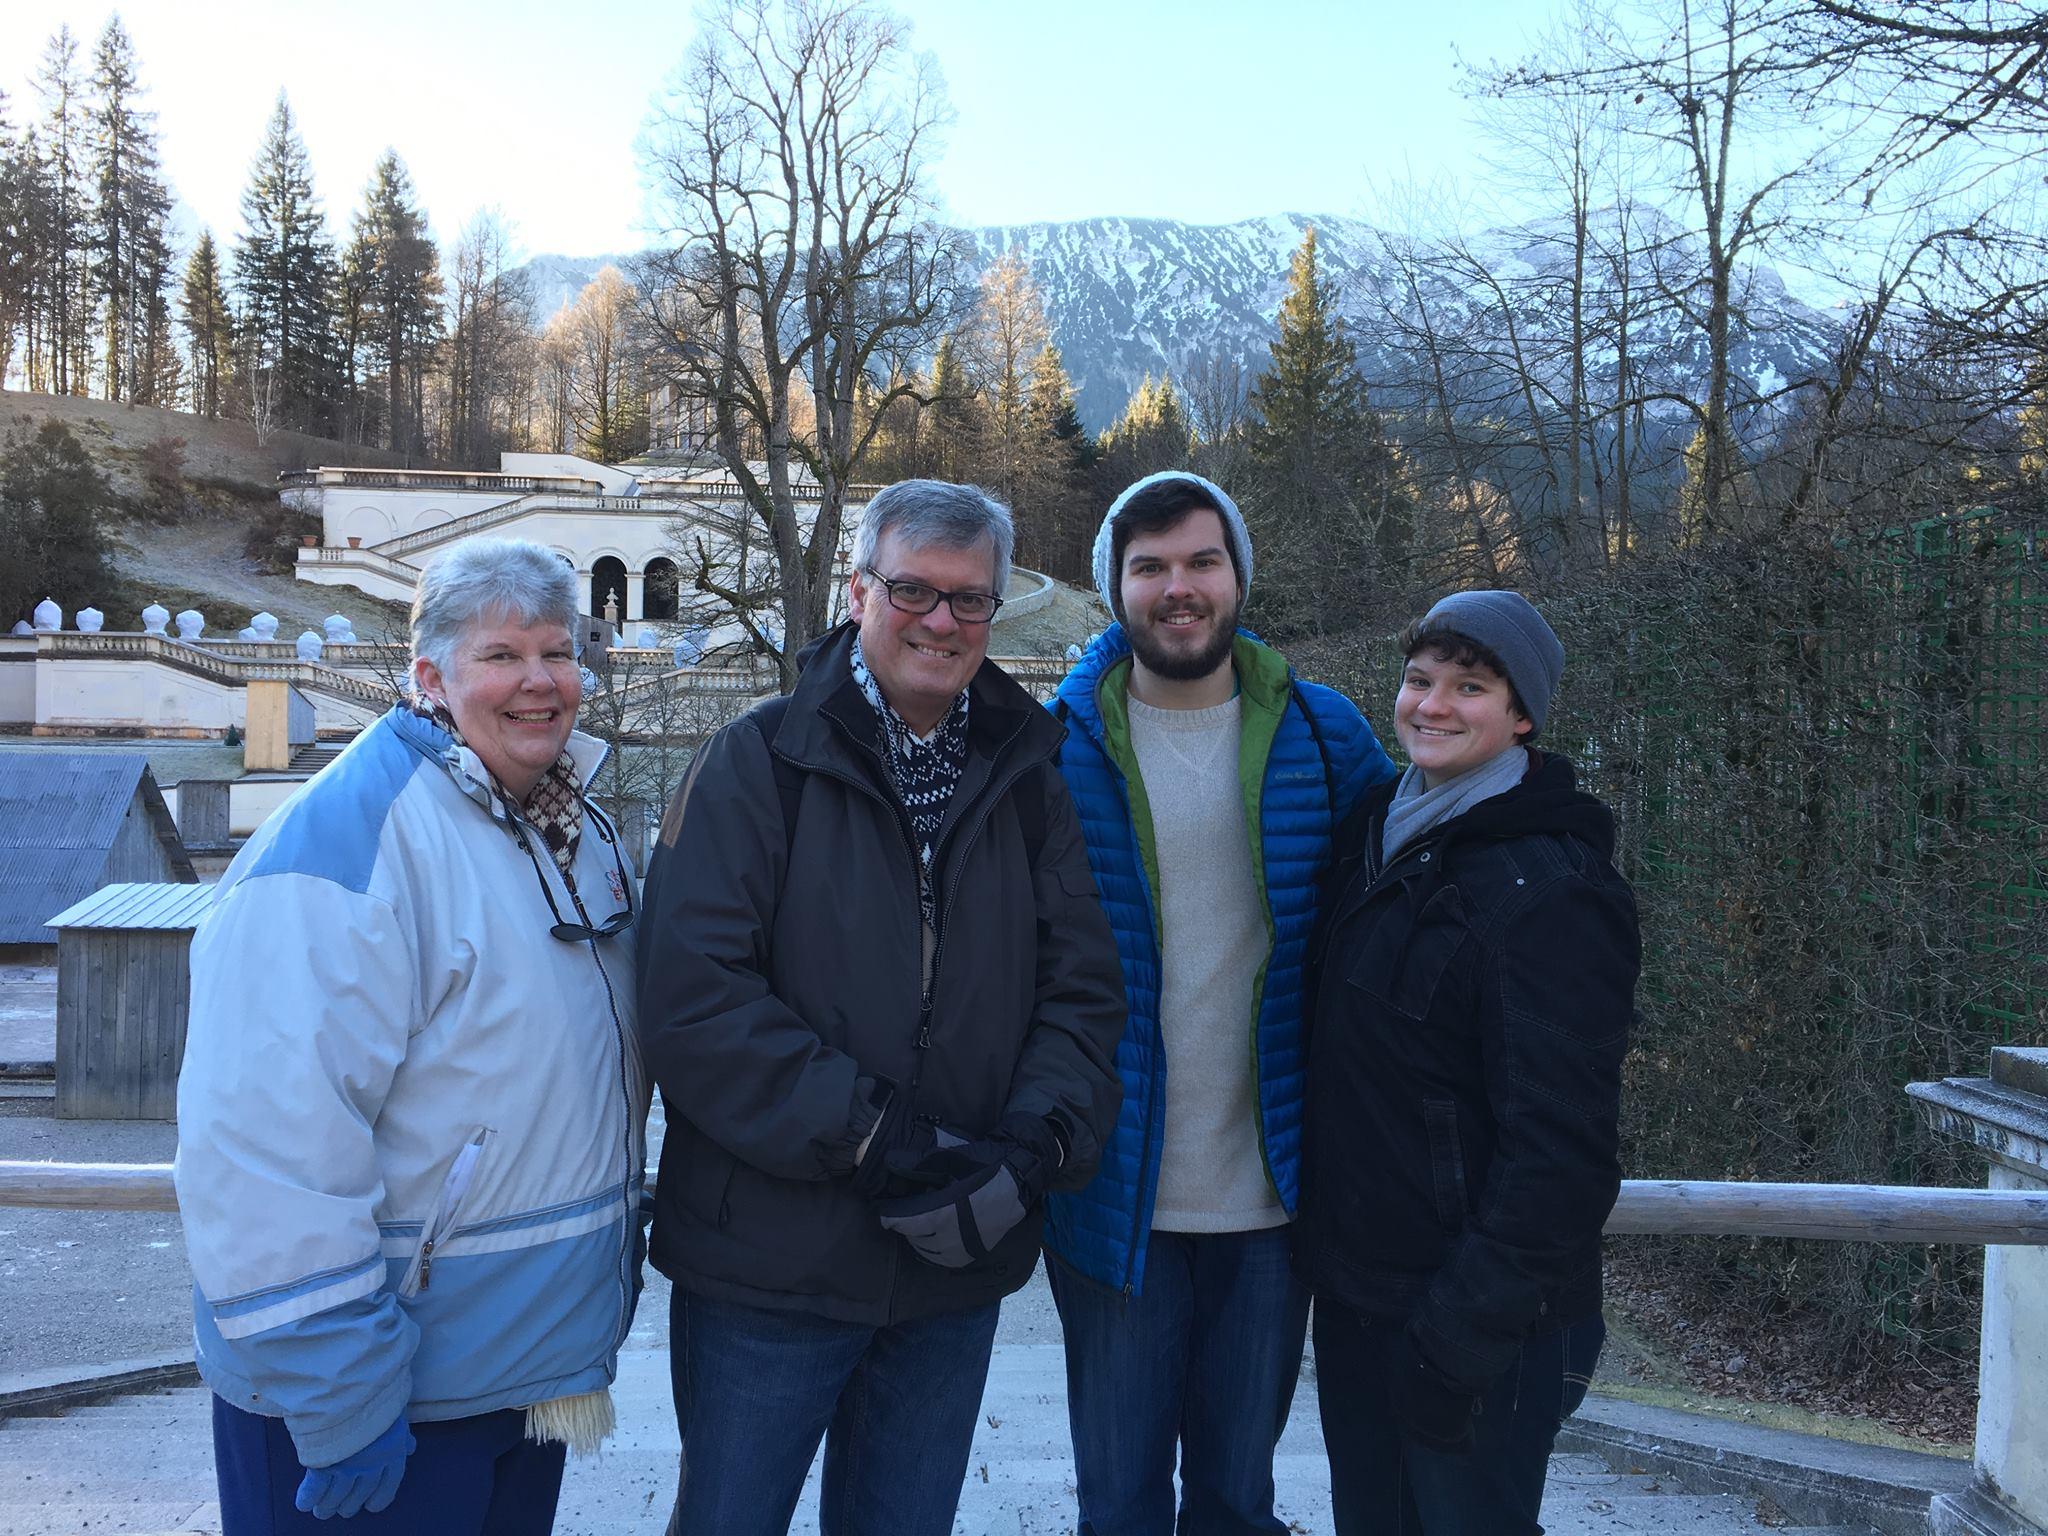 Maura Wroblewski and Family